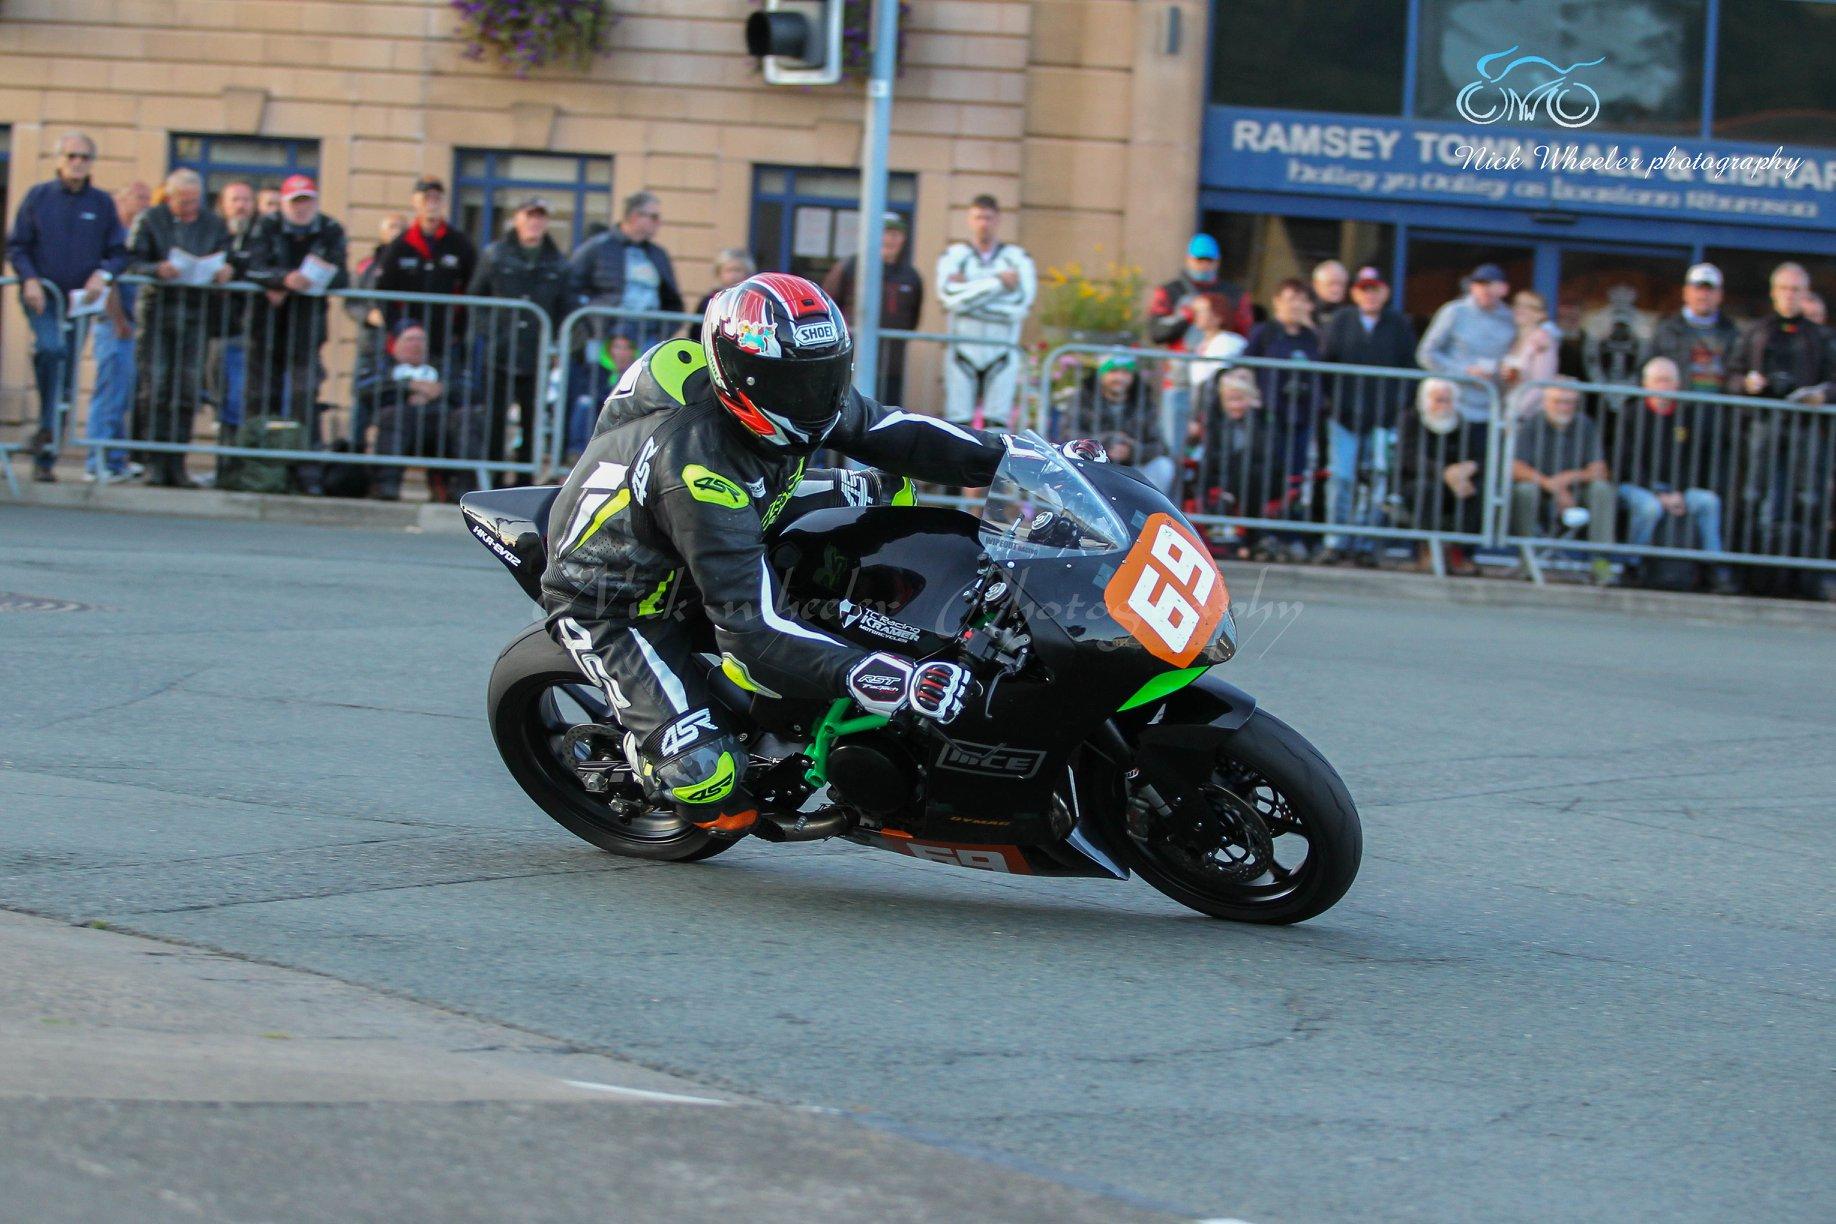 Manx GP Top 6: Sebastian Witt